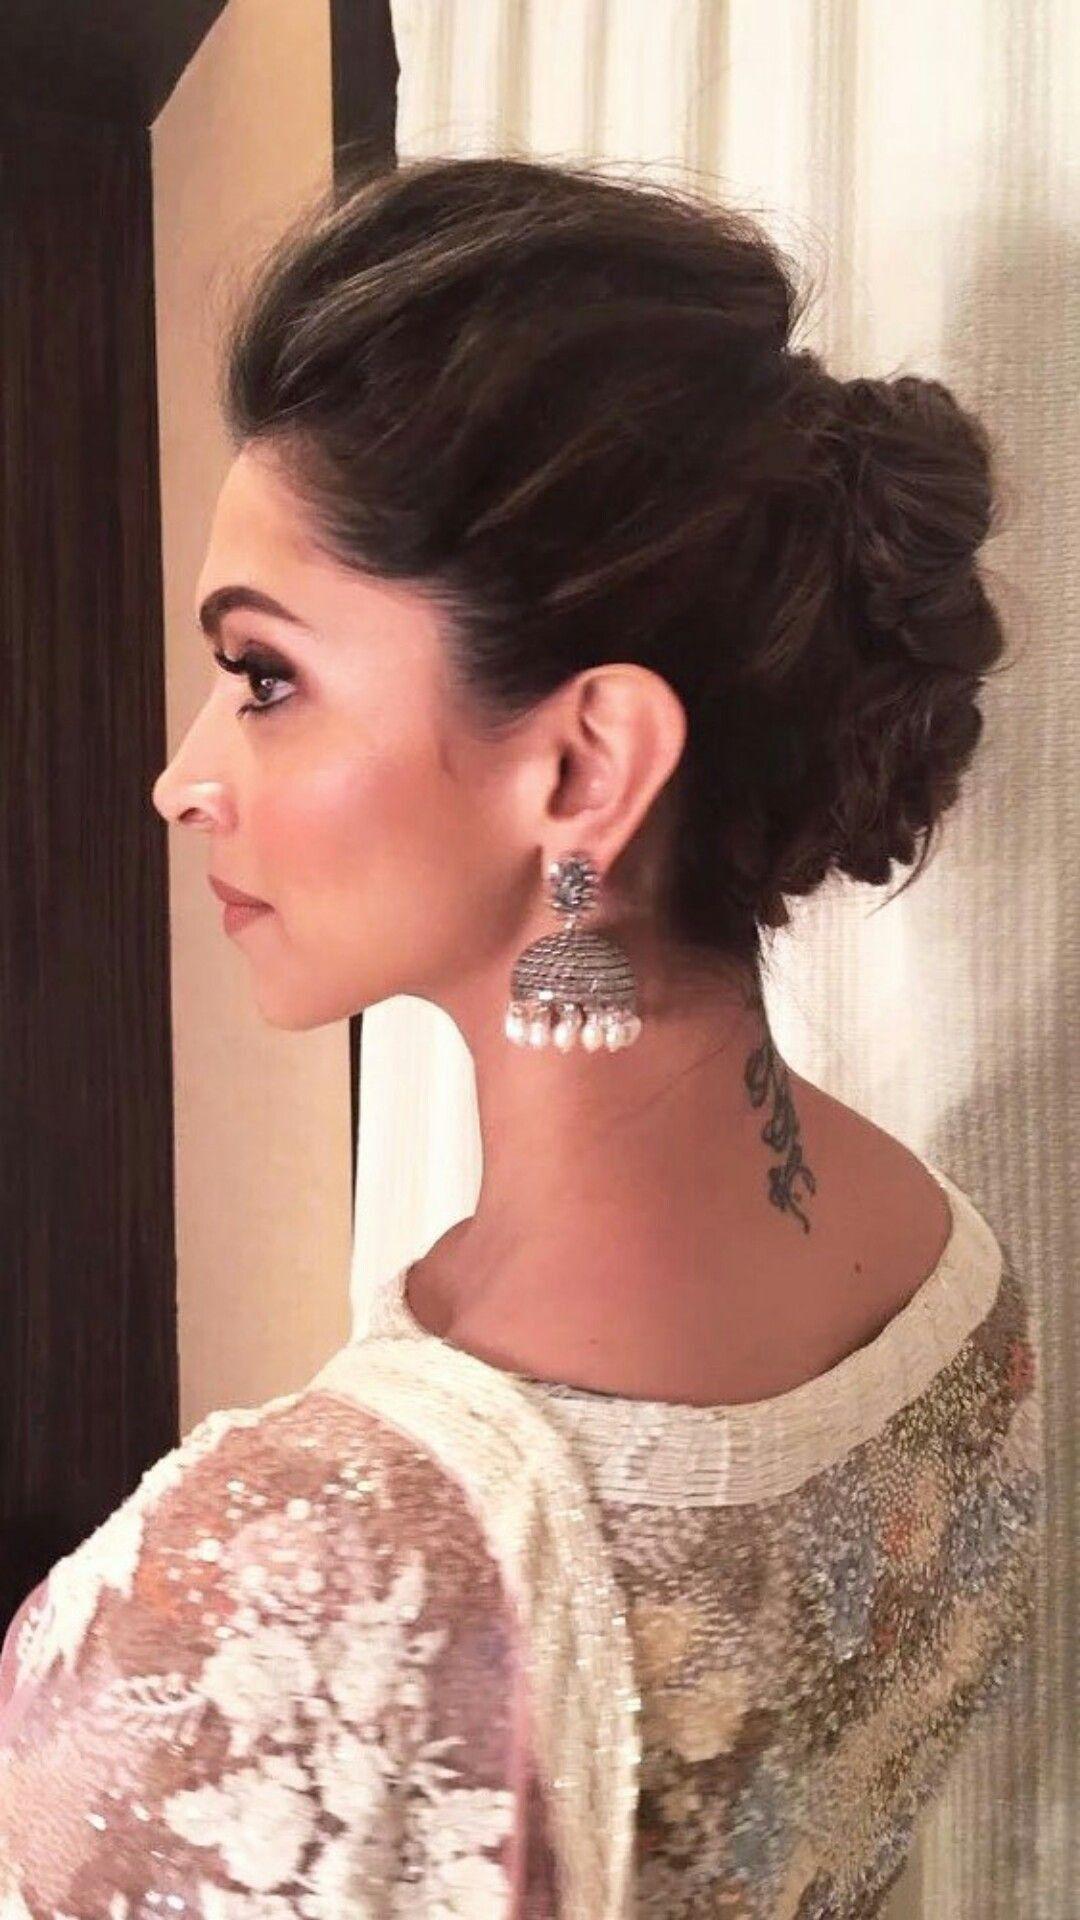 Wedding Hairstyles For Medium Hair Indian Trumpet 55 Hairstyles For Indian Weddings Medium In 2020 Hair Styles Wedding Hairstyles For Medium Hair Indian Hairstyles